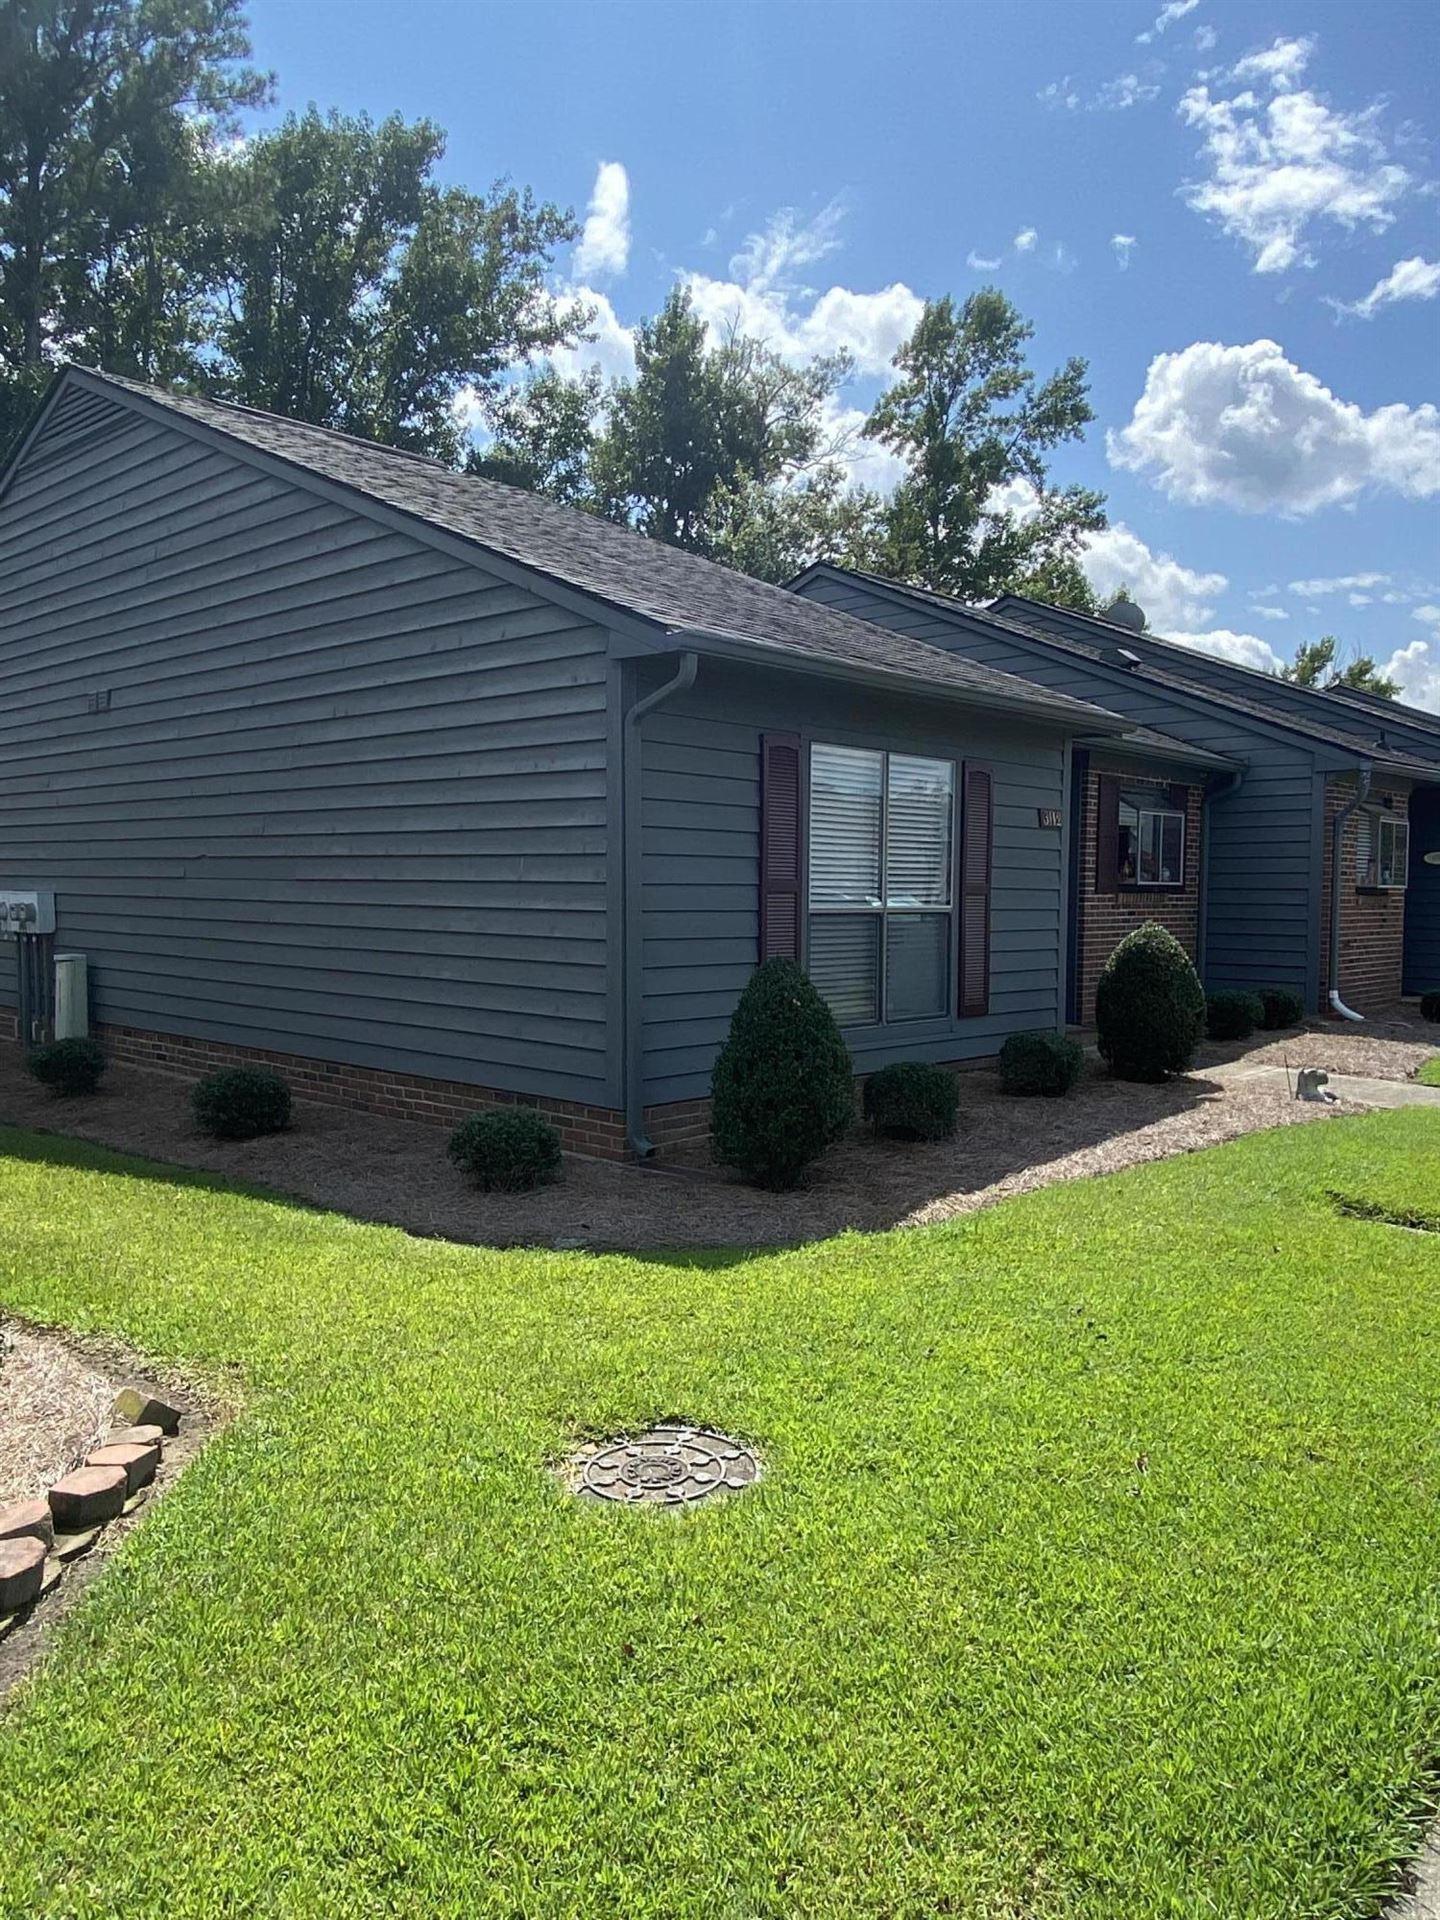 Photo of 3112 Fox Run Drive, Kinston, NC 28504 (MLS # 100287488)